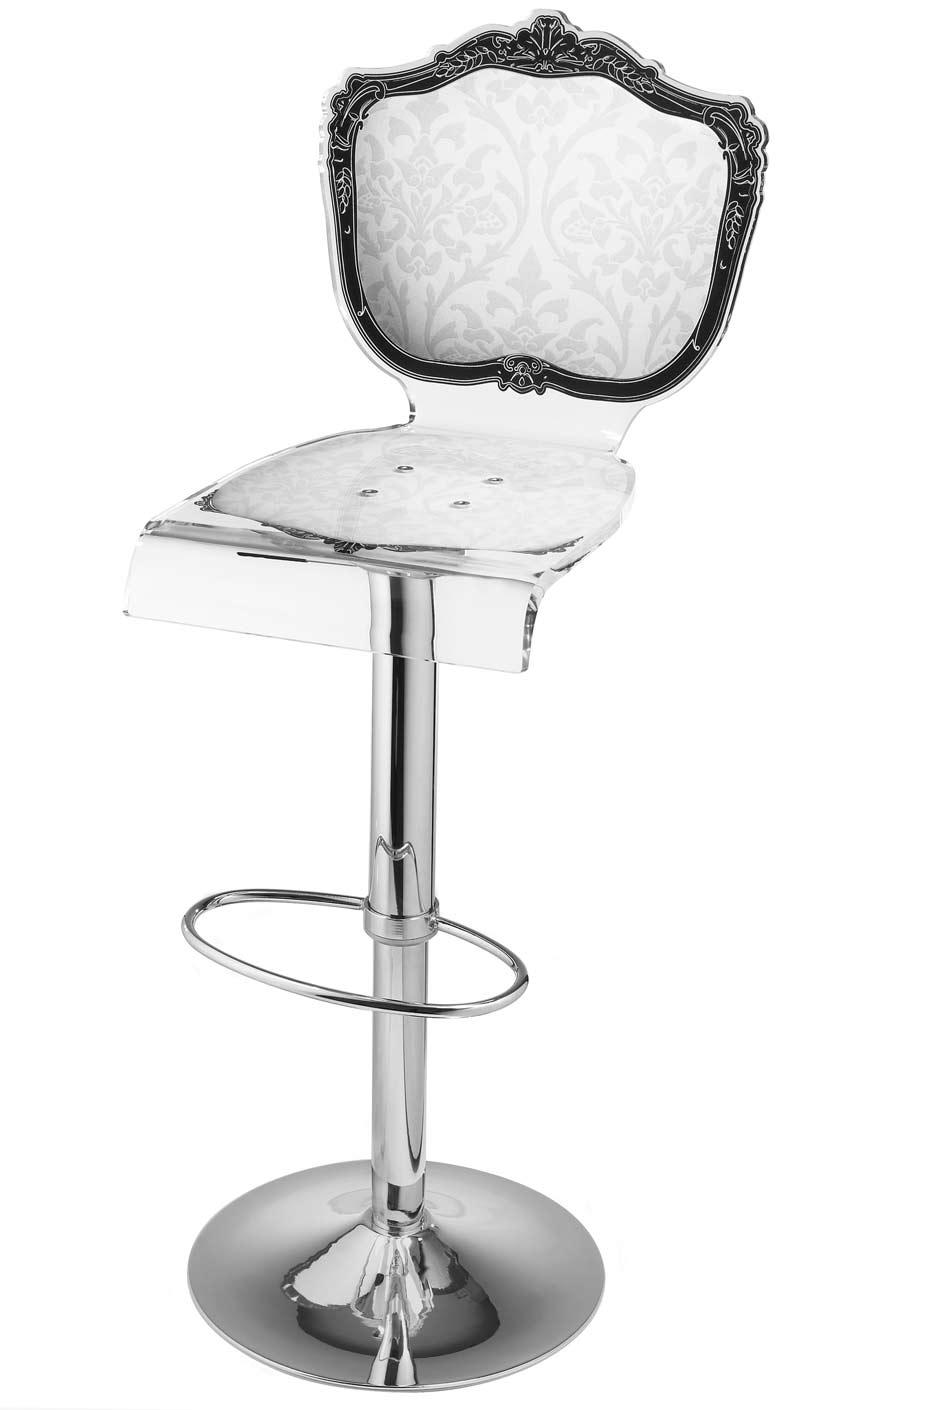 100 tabouret de bar plexi transparent tabouret de bar rudy blanc tabourets but tabouret. Black Bedroom Furniture Sets. Home Design Ideas